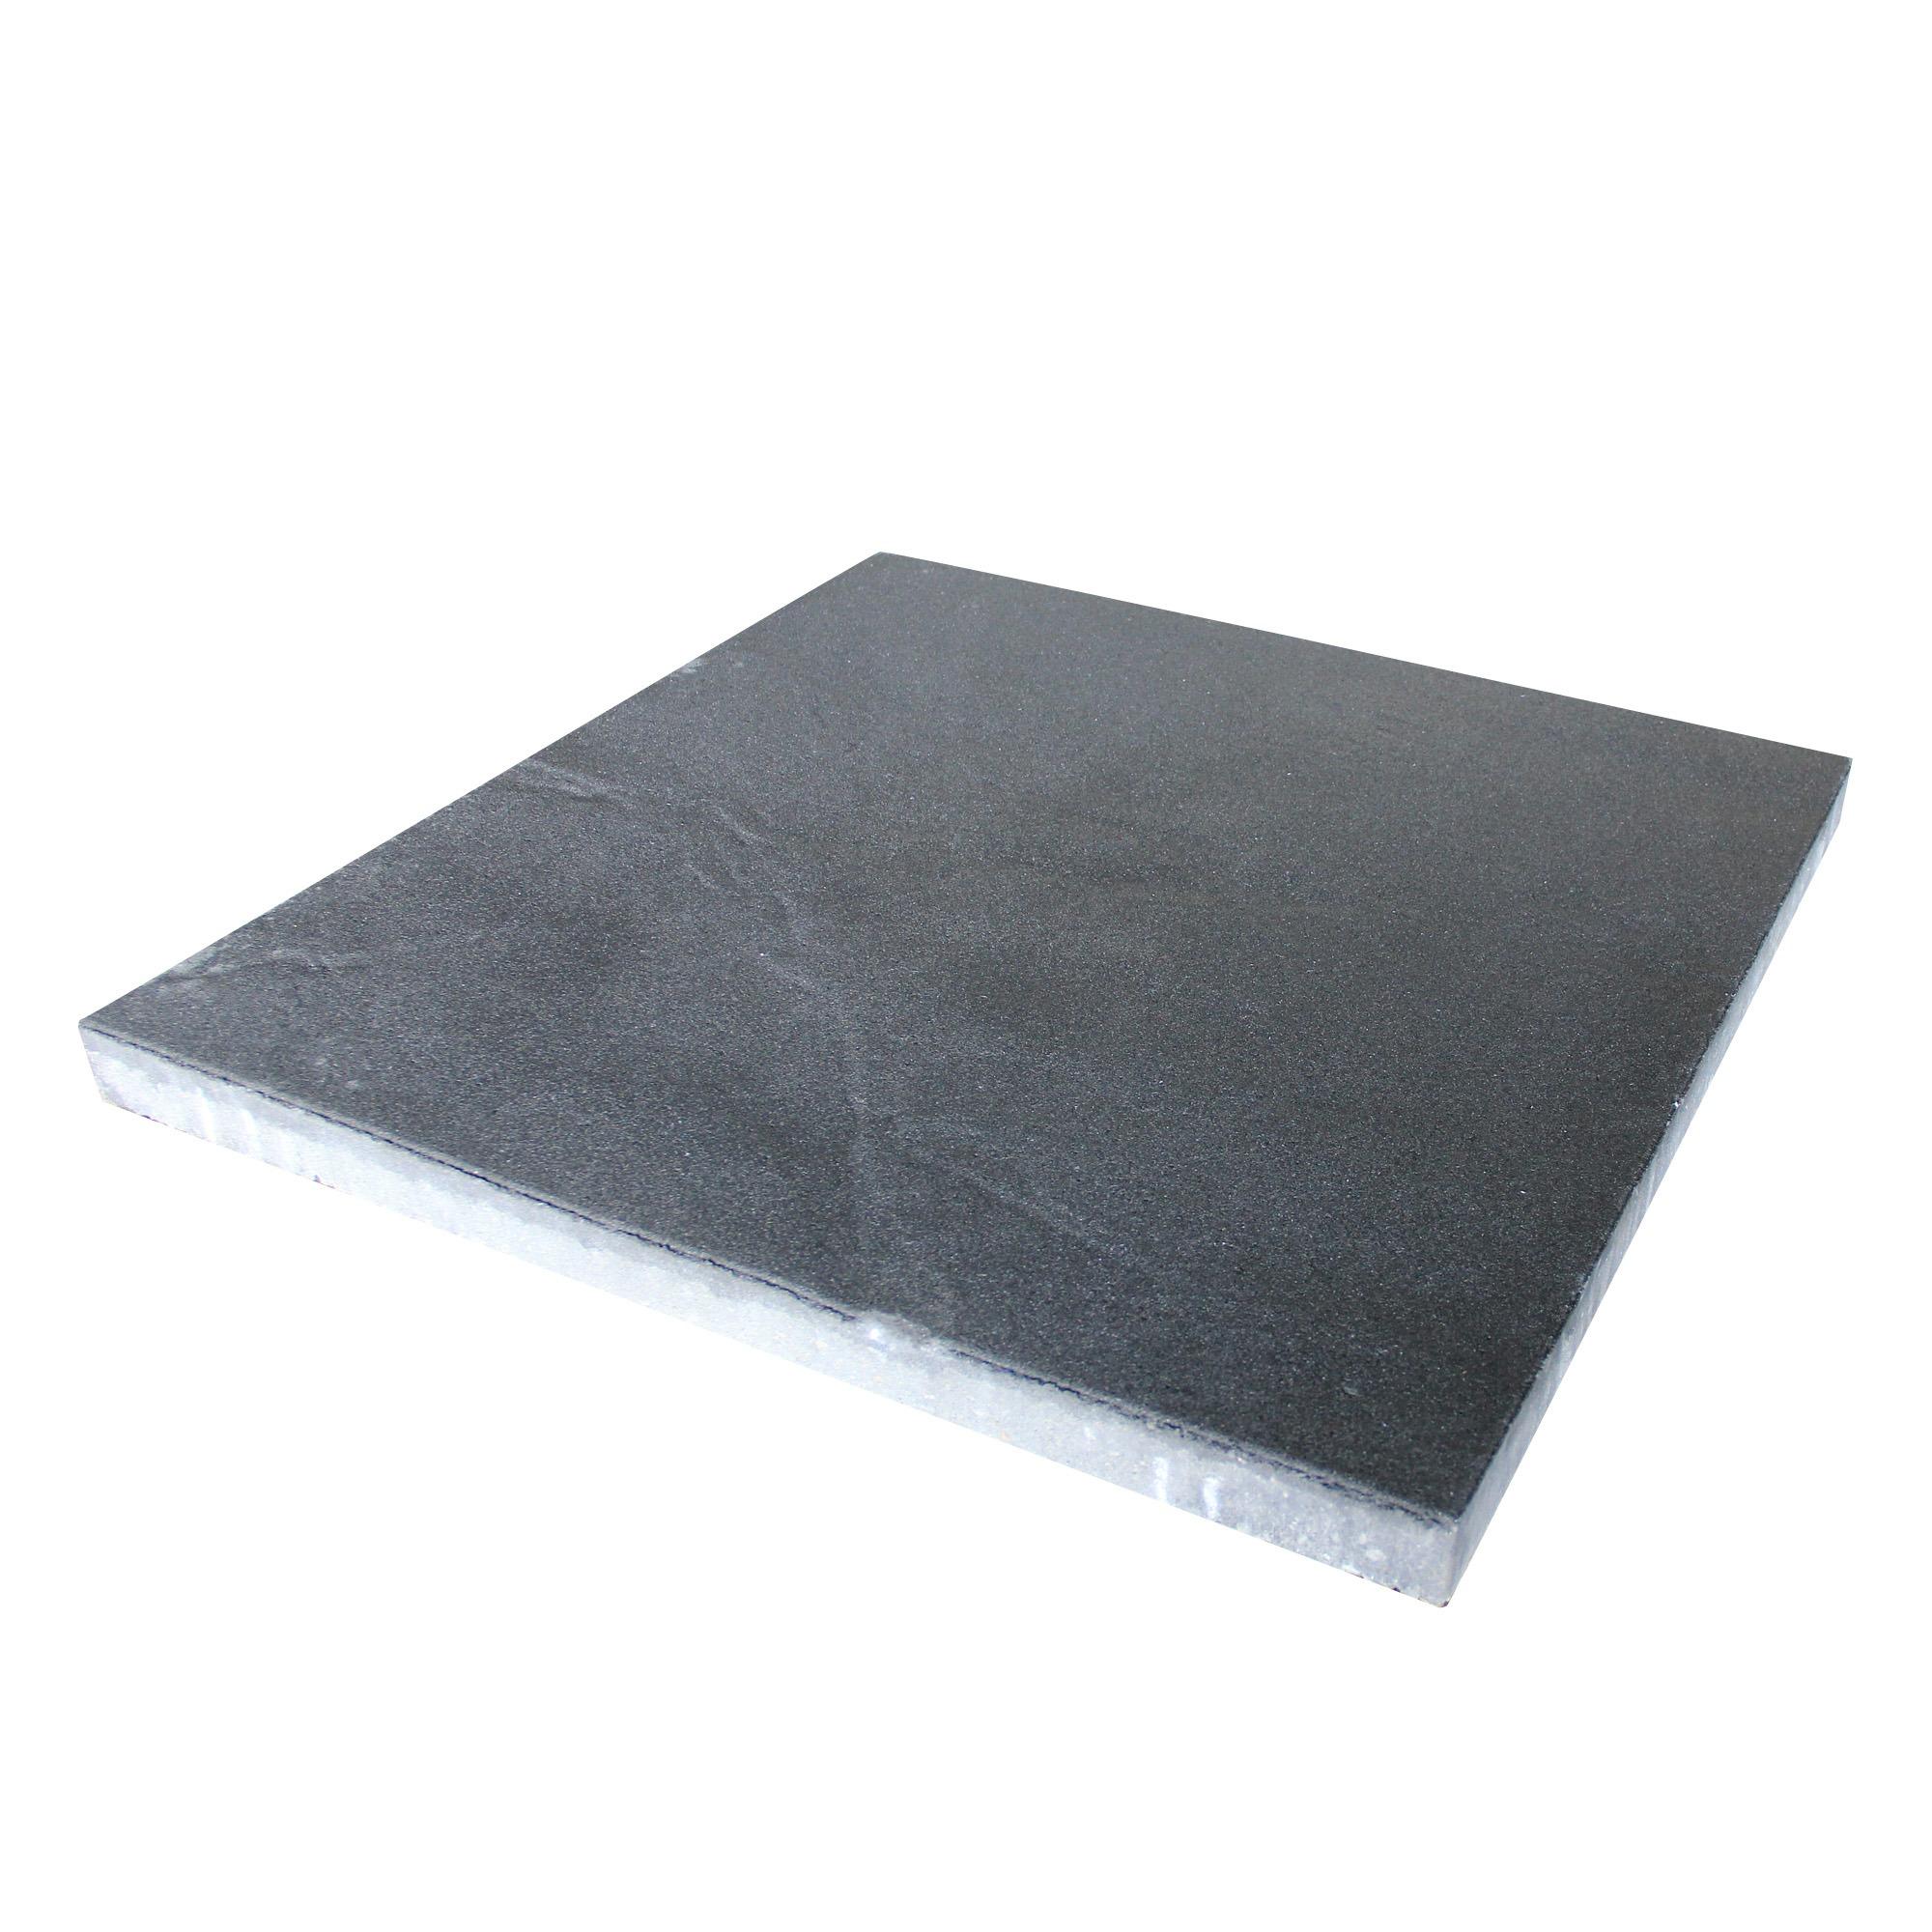 Terrastegel Beton Ardechio Antraciet 60x60 cm - Per Tegel - 0,36 m2